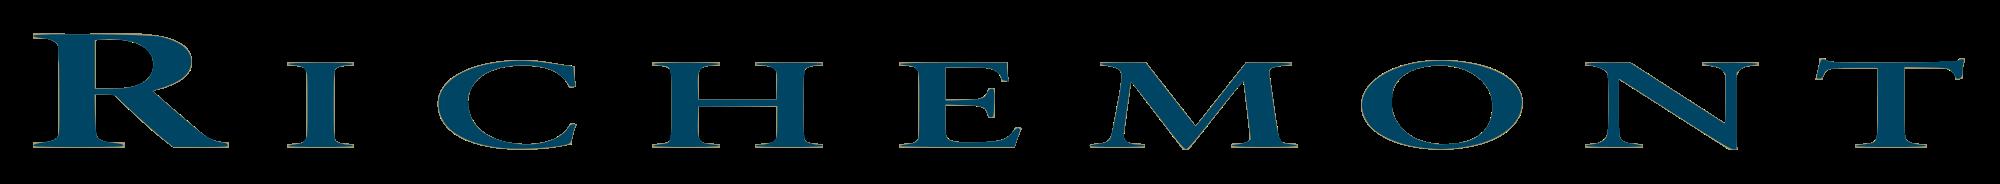 R Client Logo